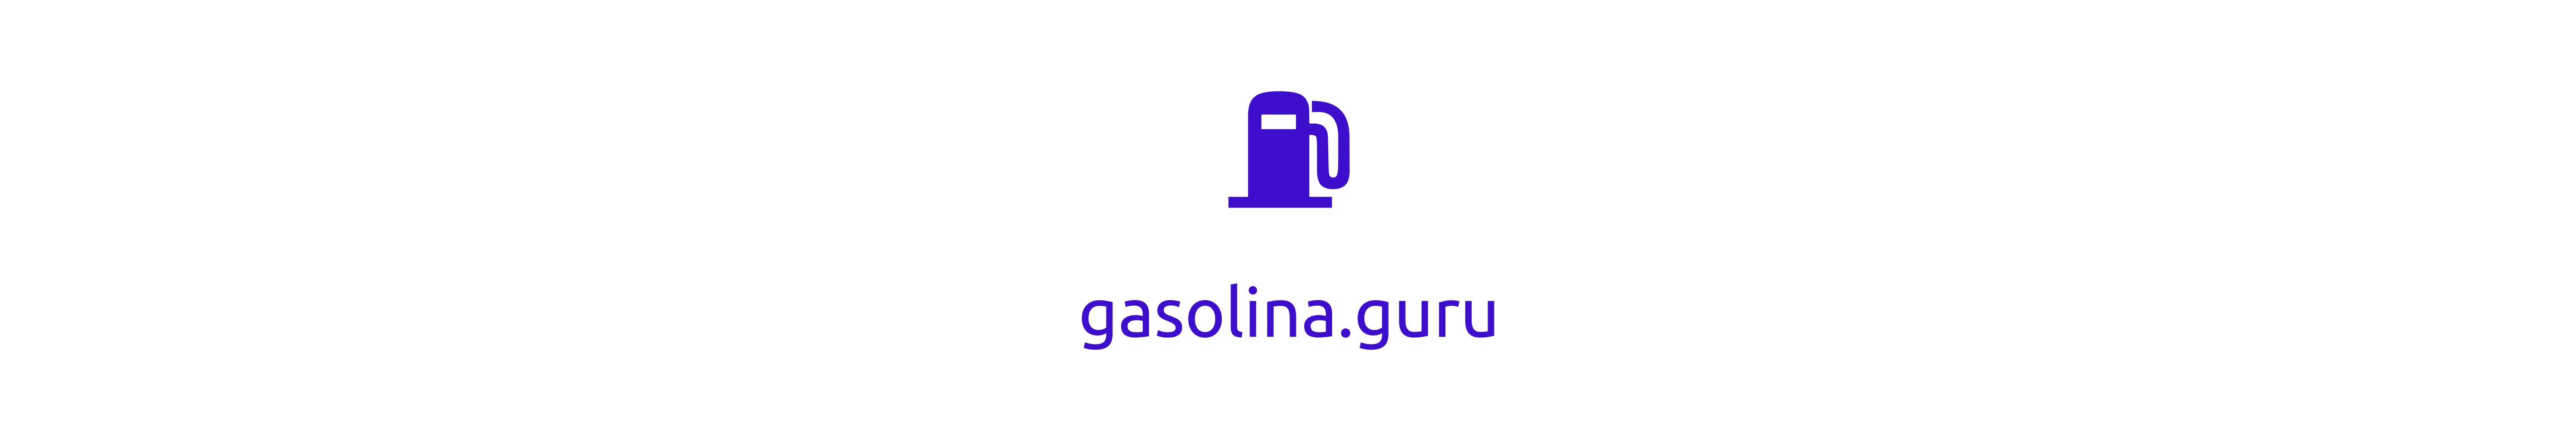 gasolina.guru